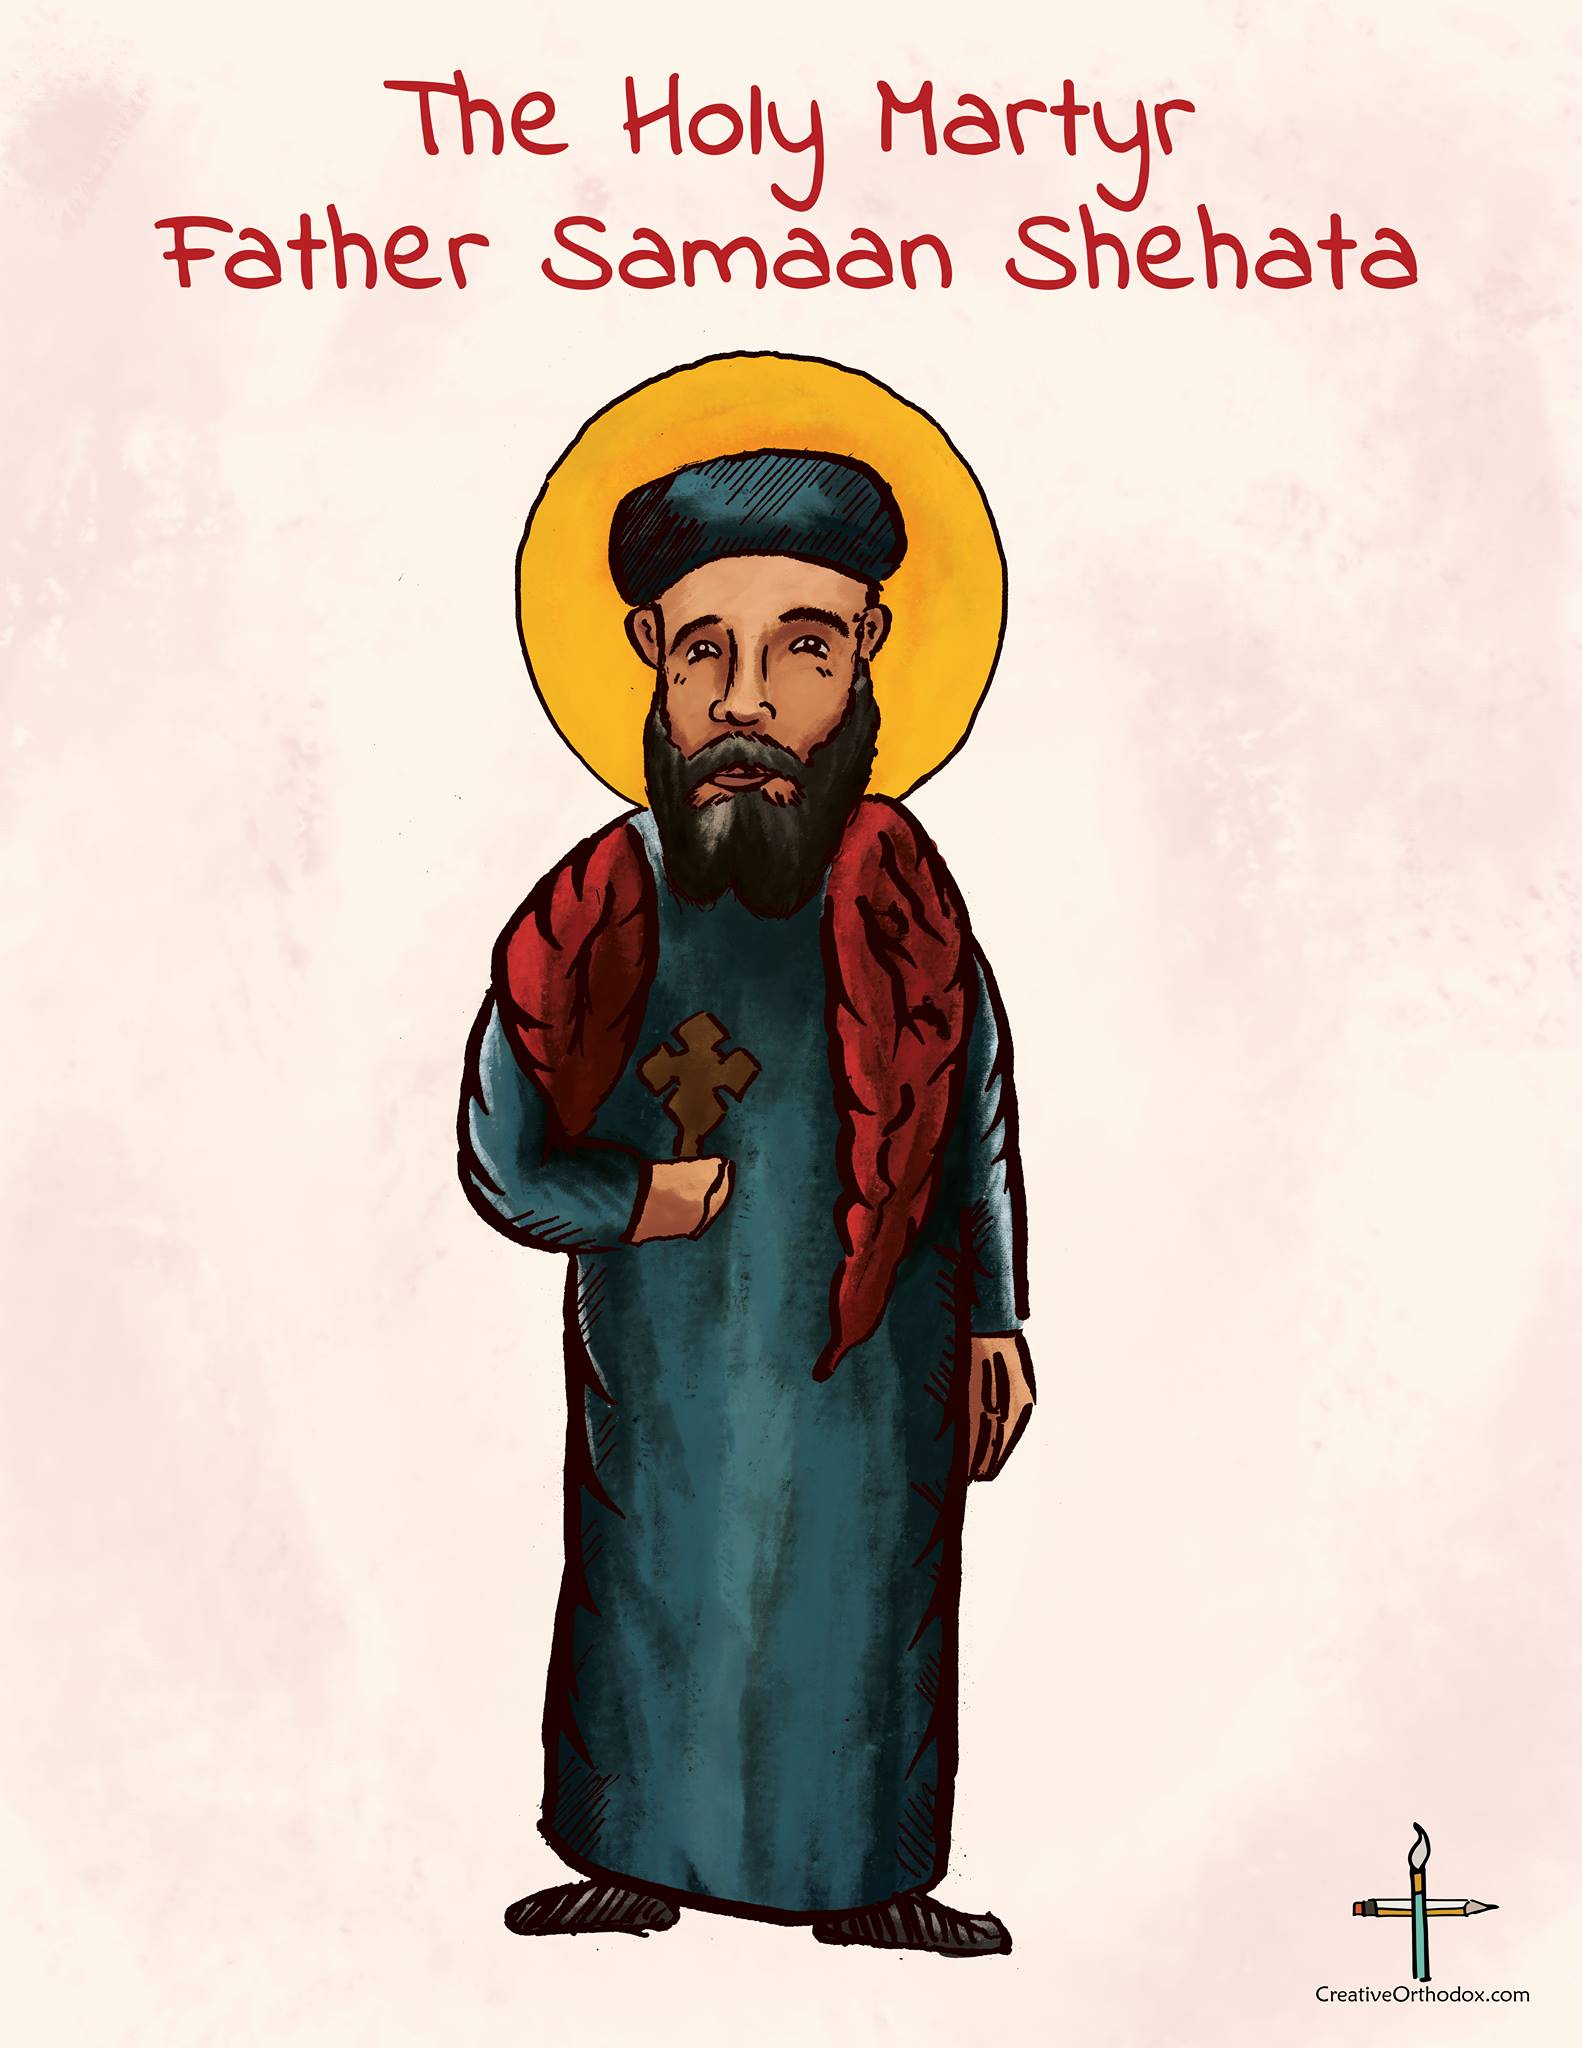 Father-Samaan-Shehata-the-Holy-Martyr